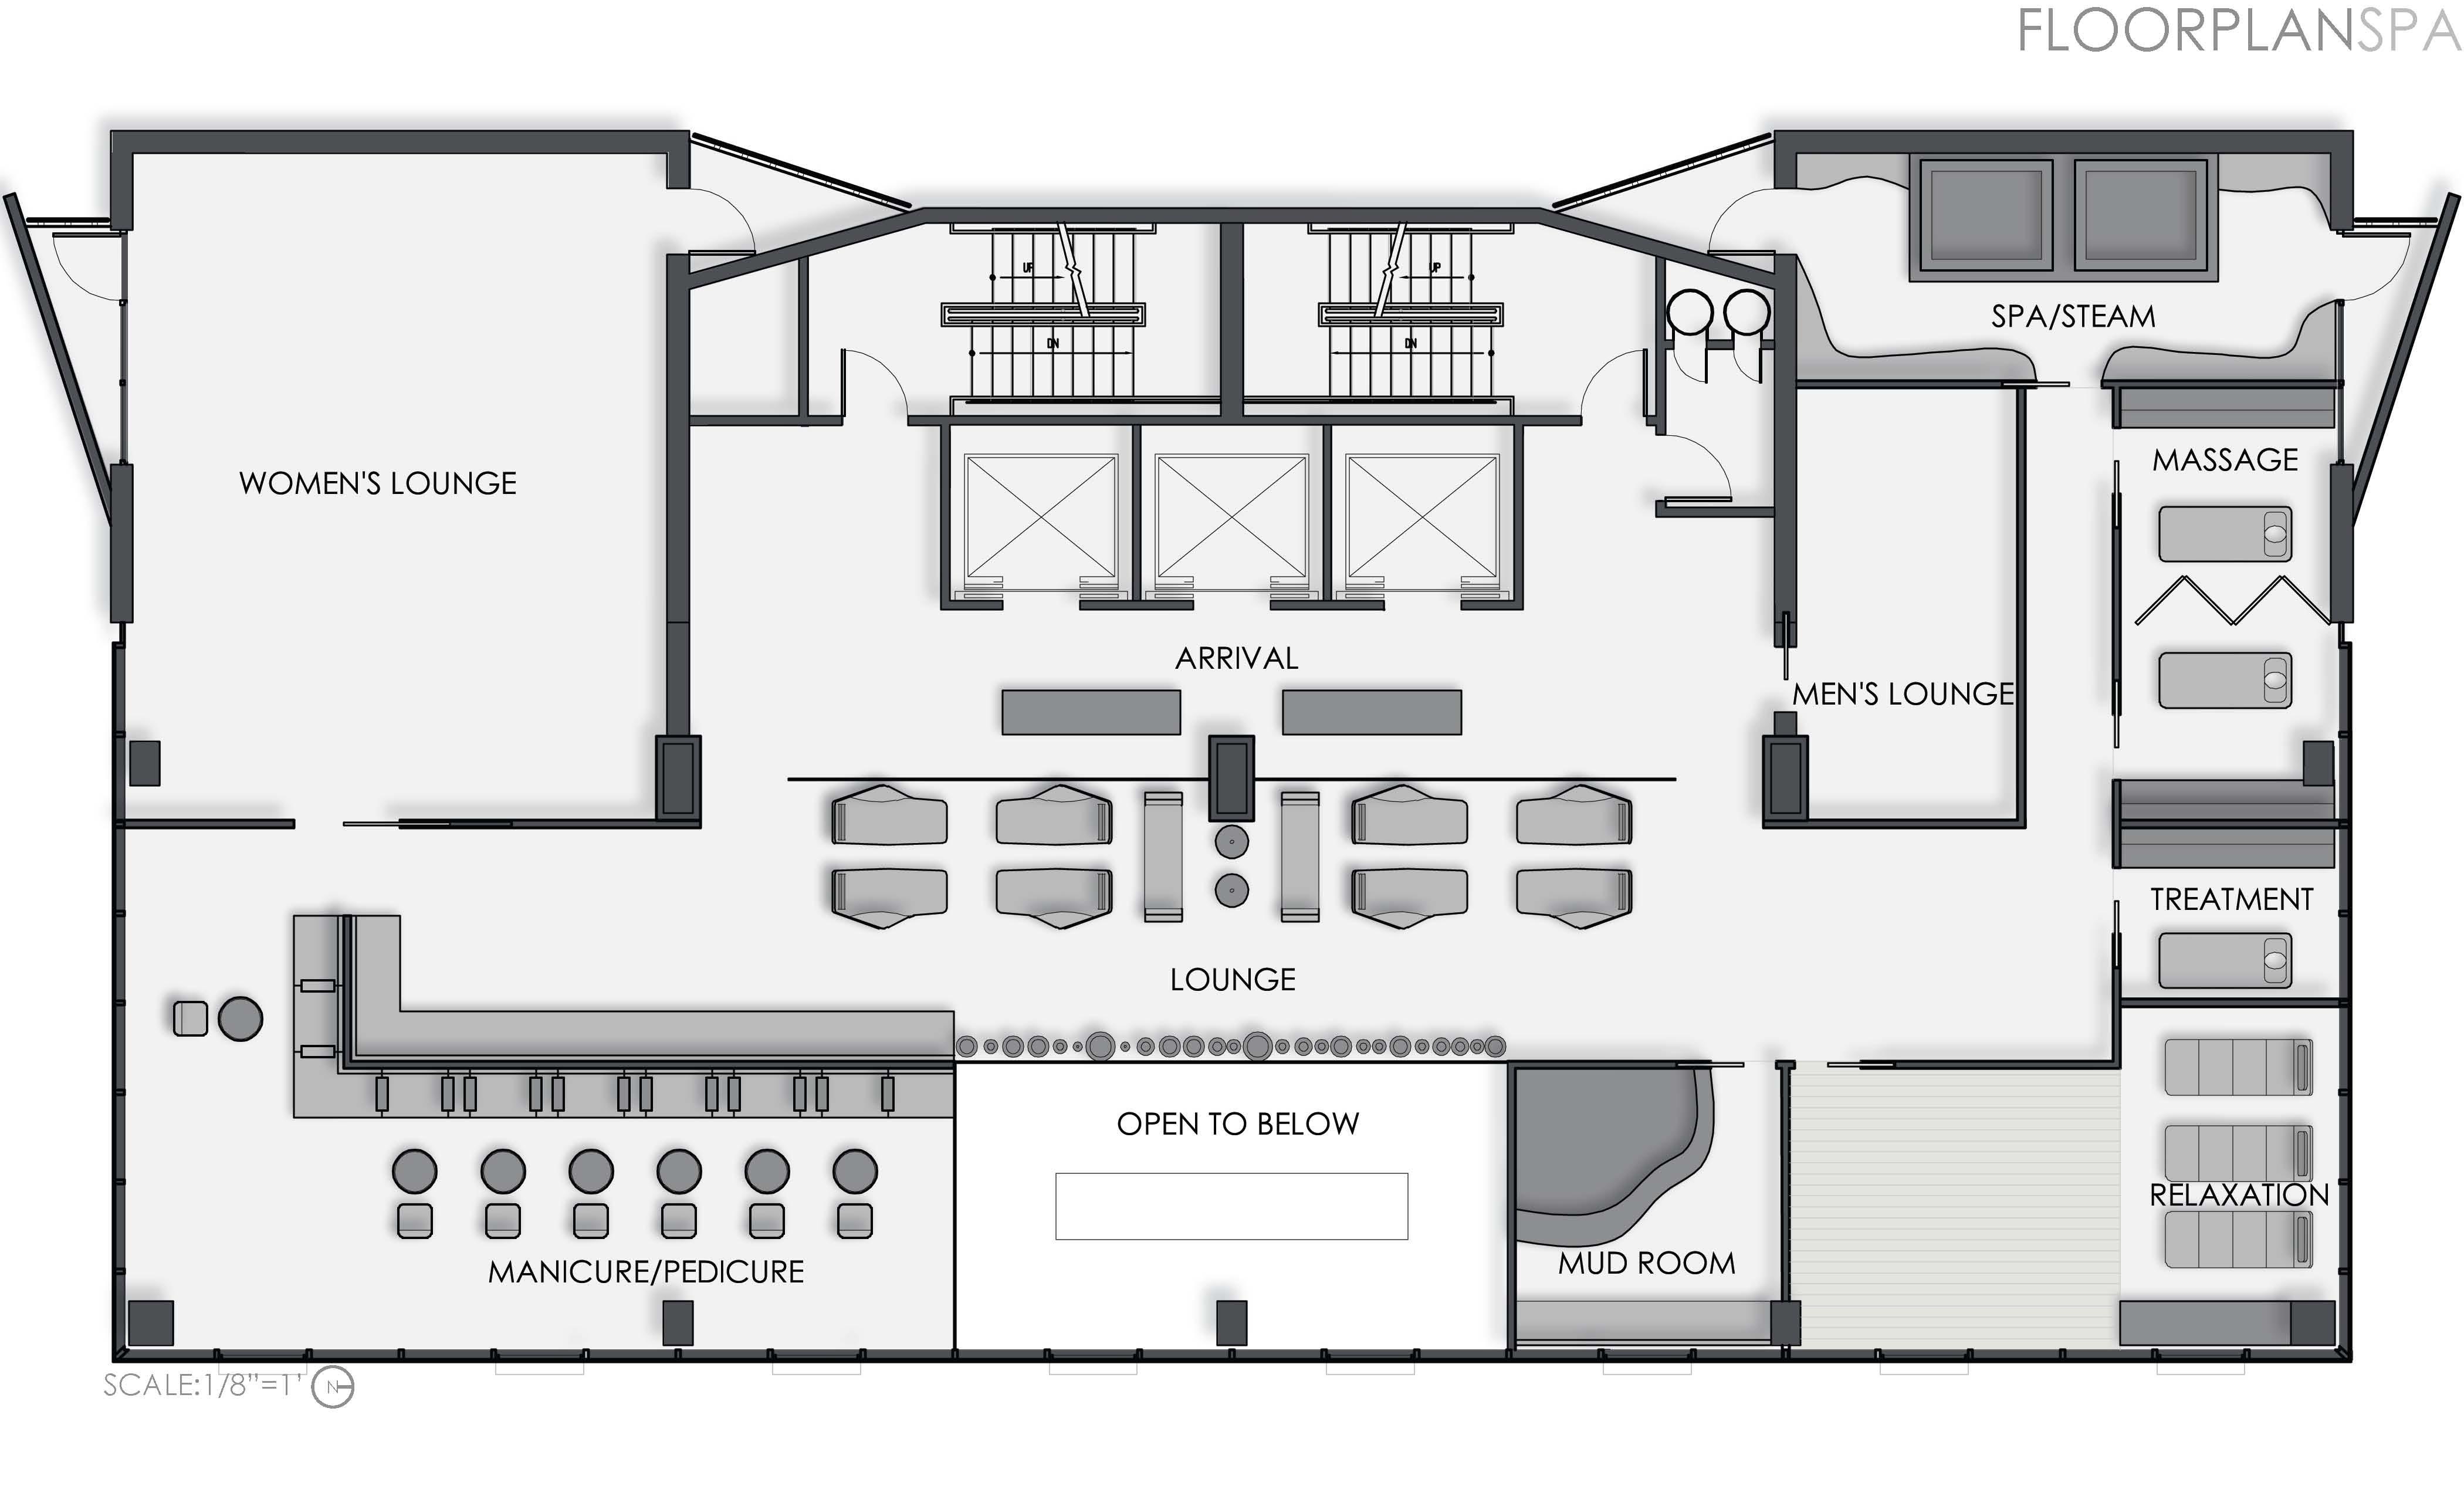 spa floor plan design gurus floor h favorite qview full size spa floor plan